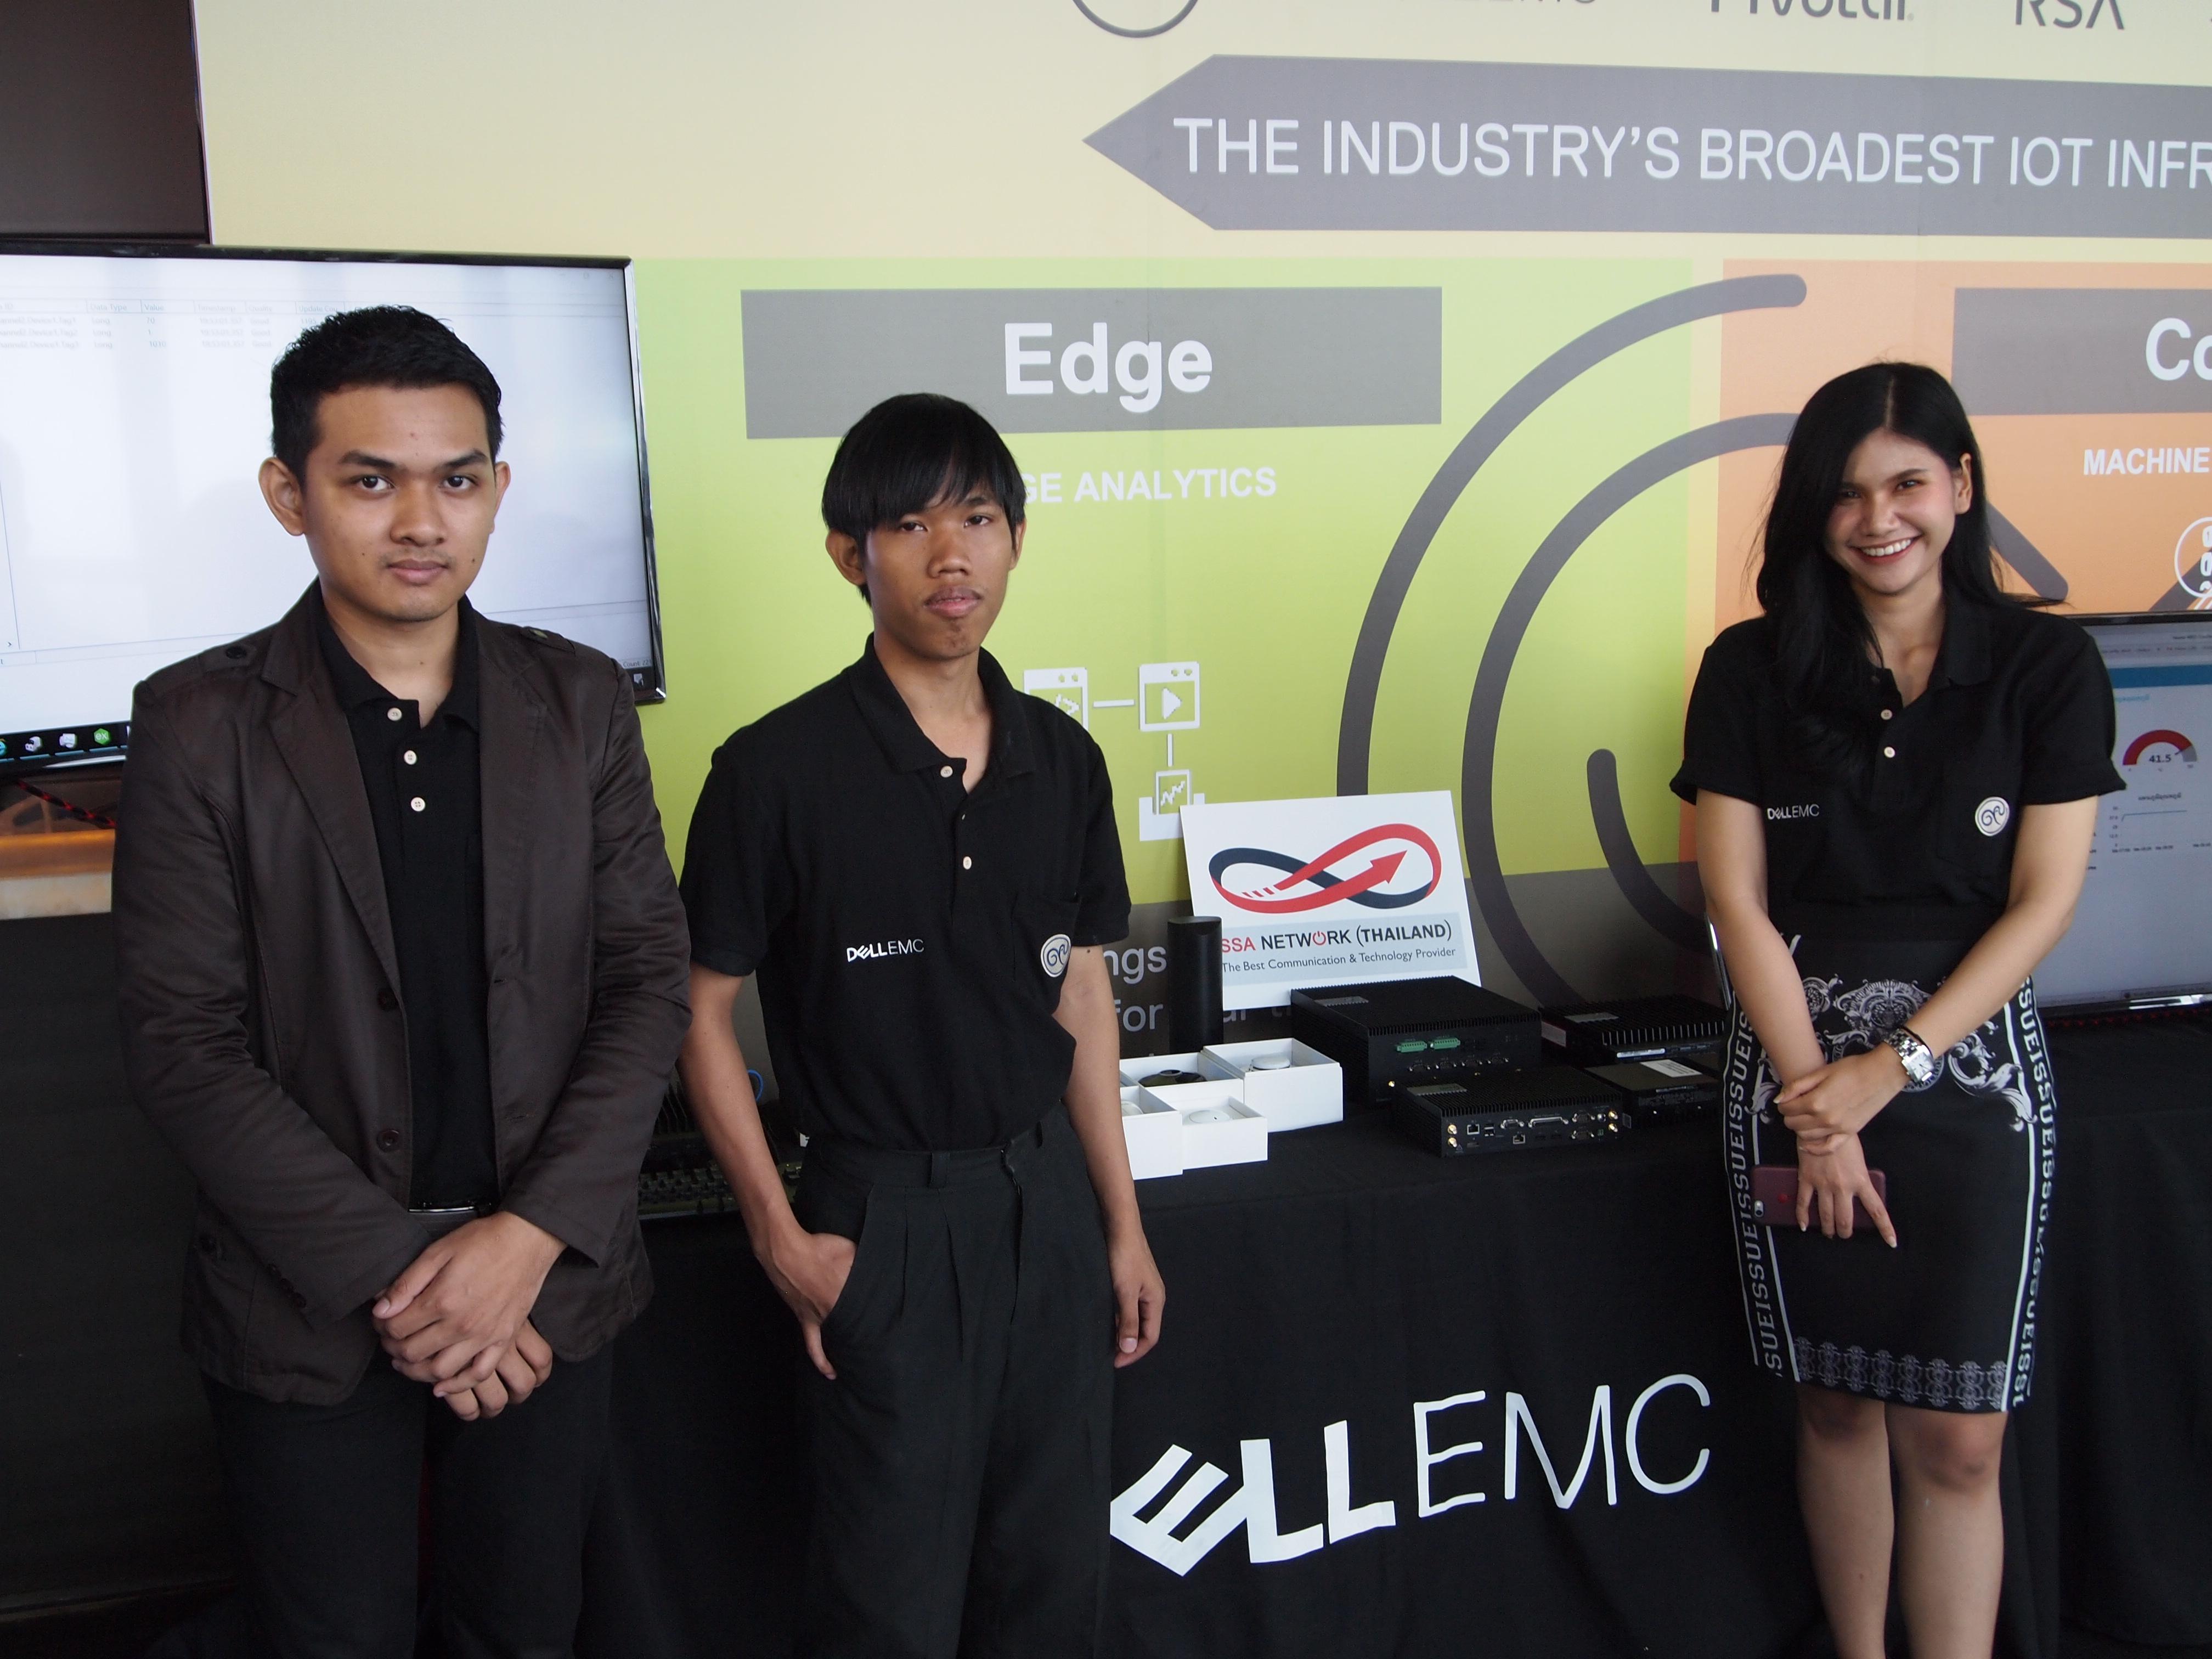 dell-emc-แถลงข่าว-IoT-ssanetwork (2)